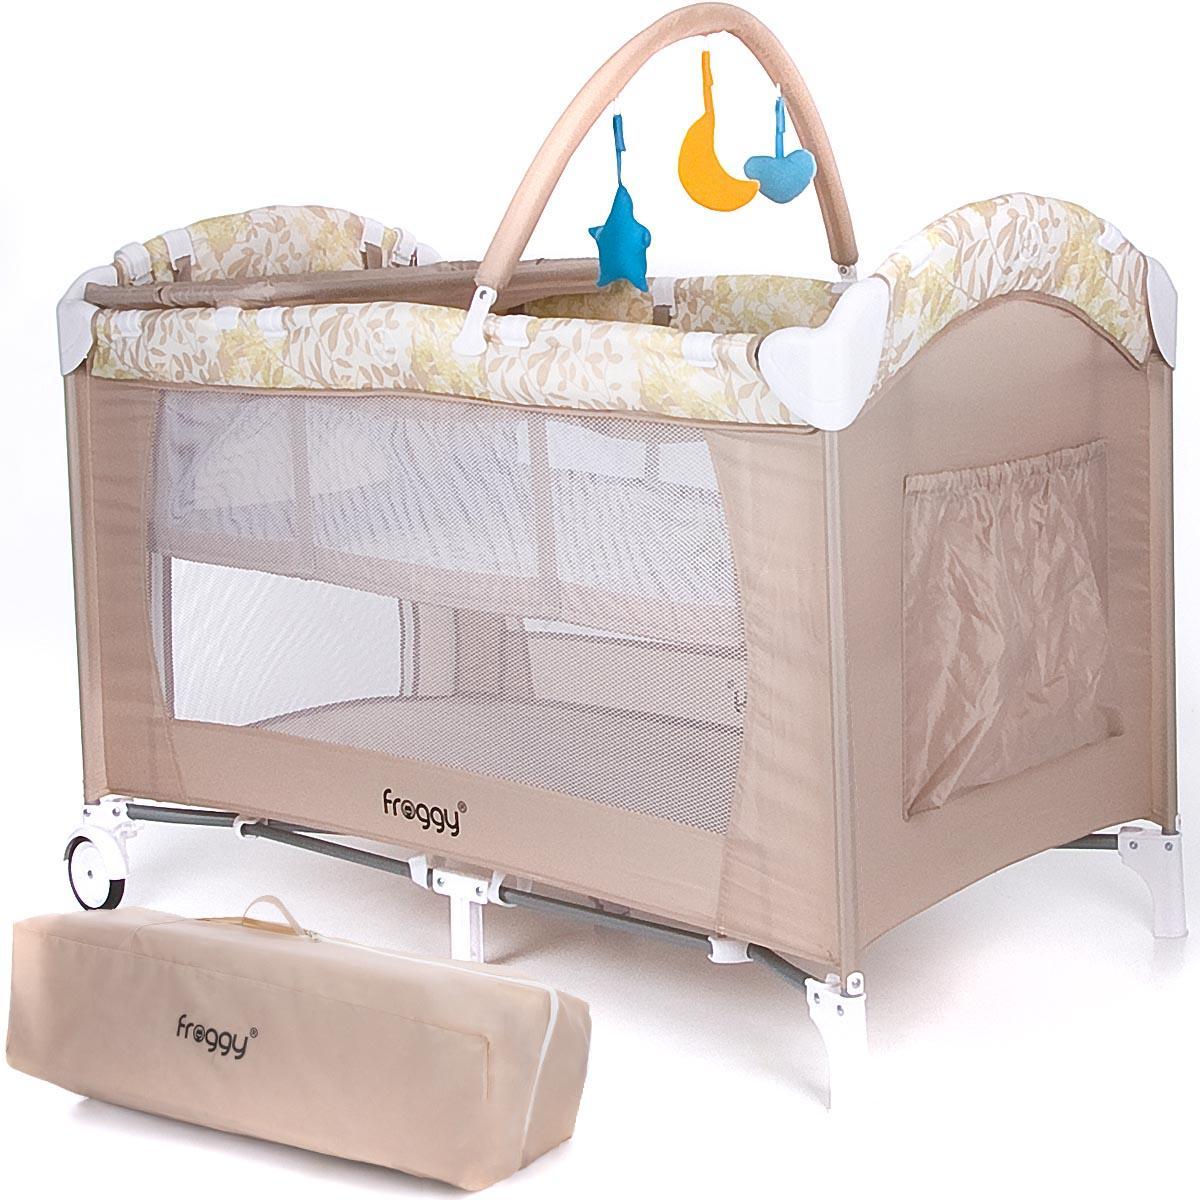 Kinderbett babybett klappbett laufstall reisebett for Kinderbett baby